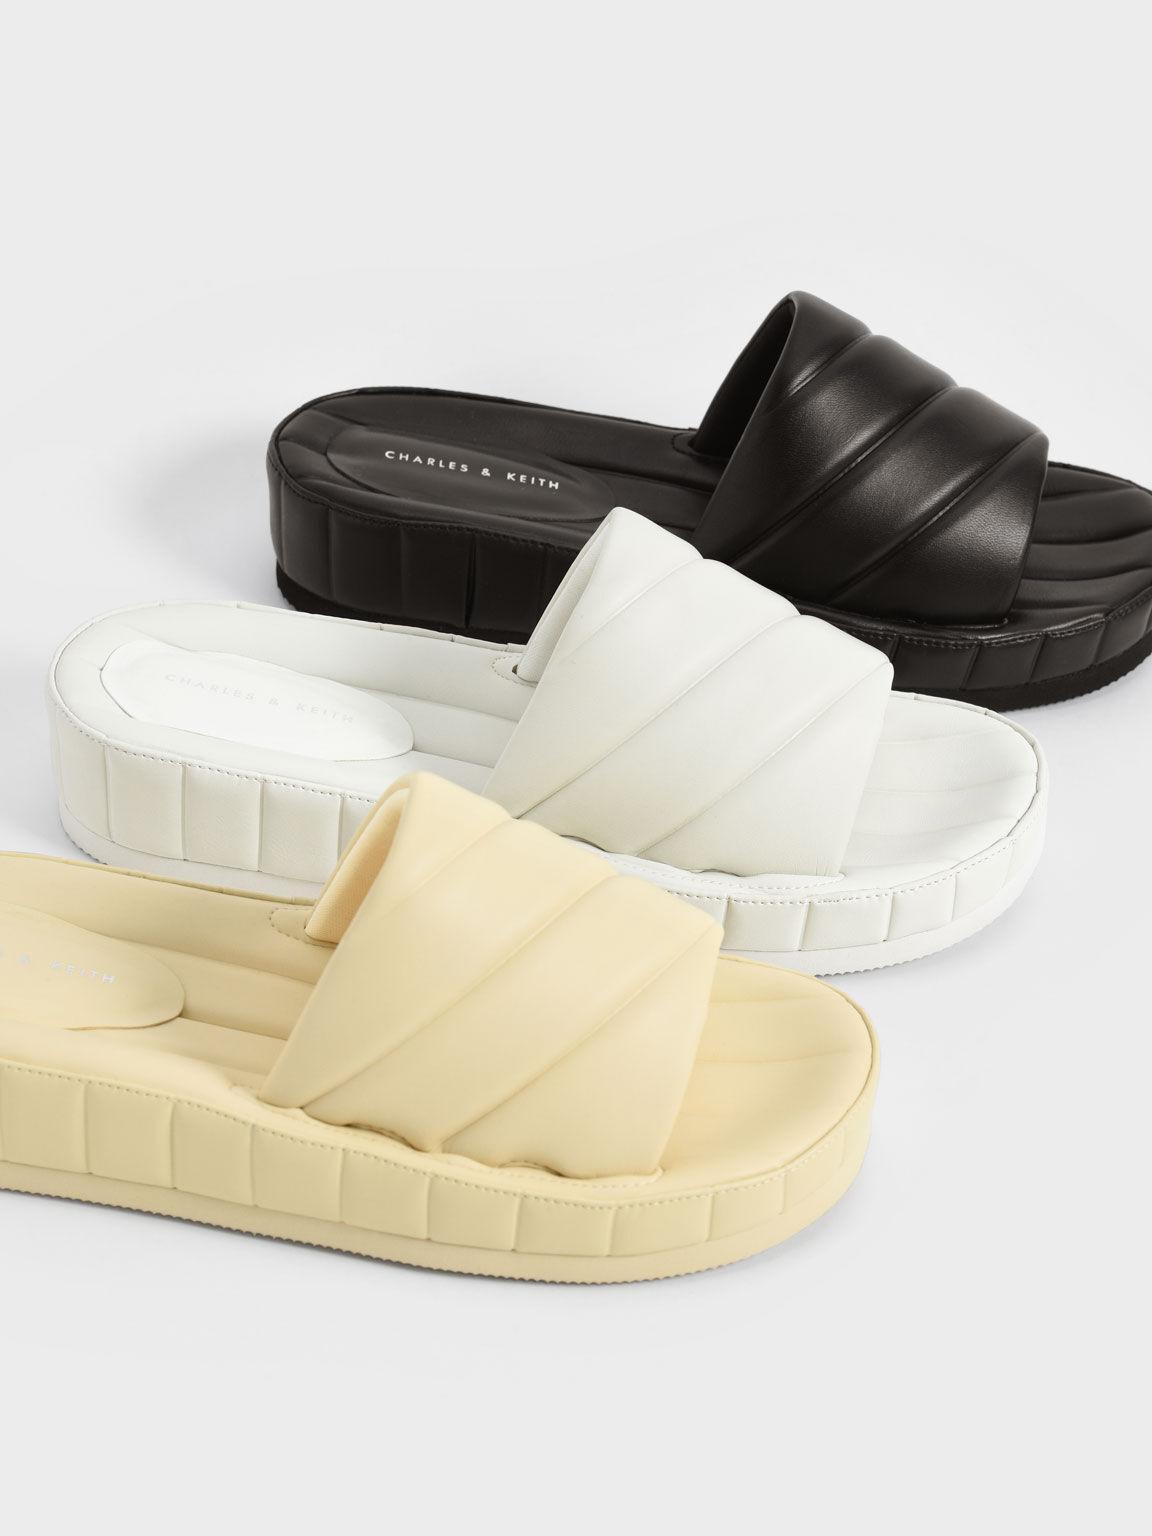 Puffy Flatform Slide Sandals, White, hi-res